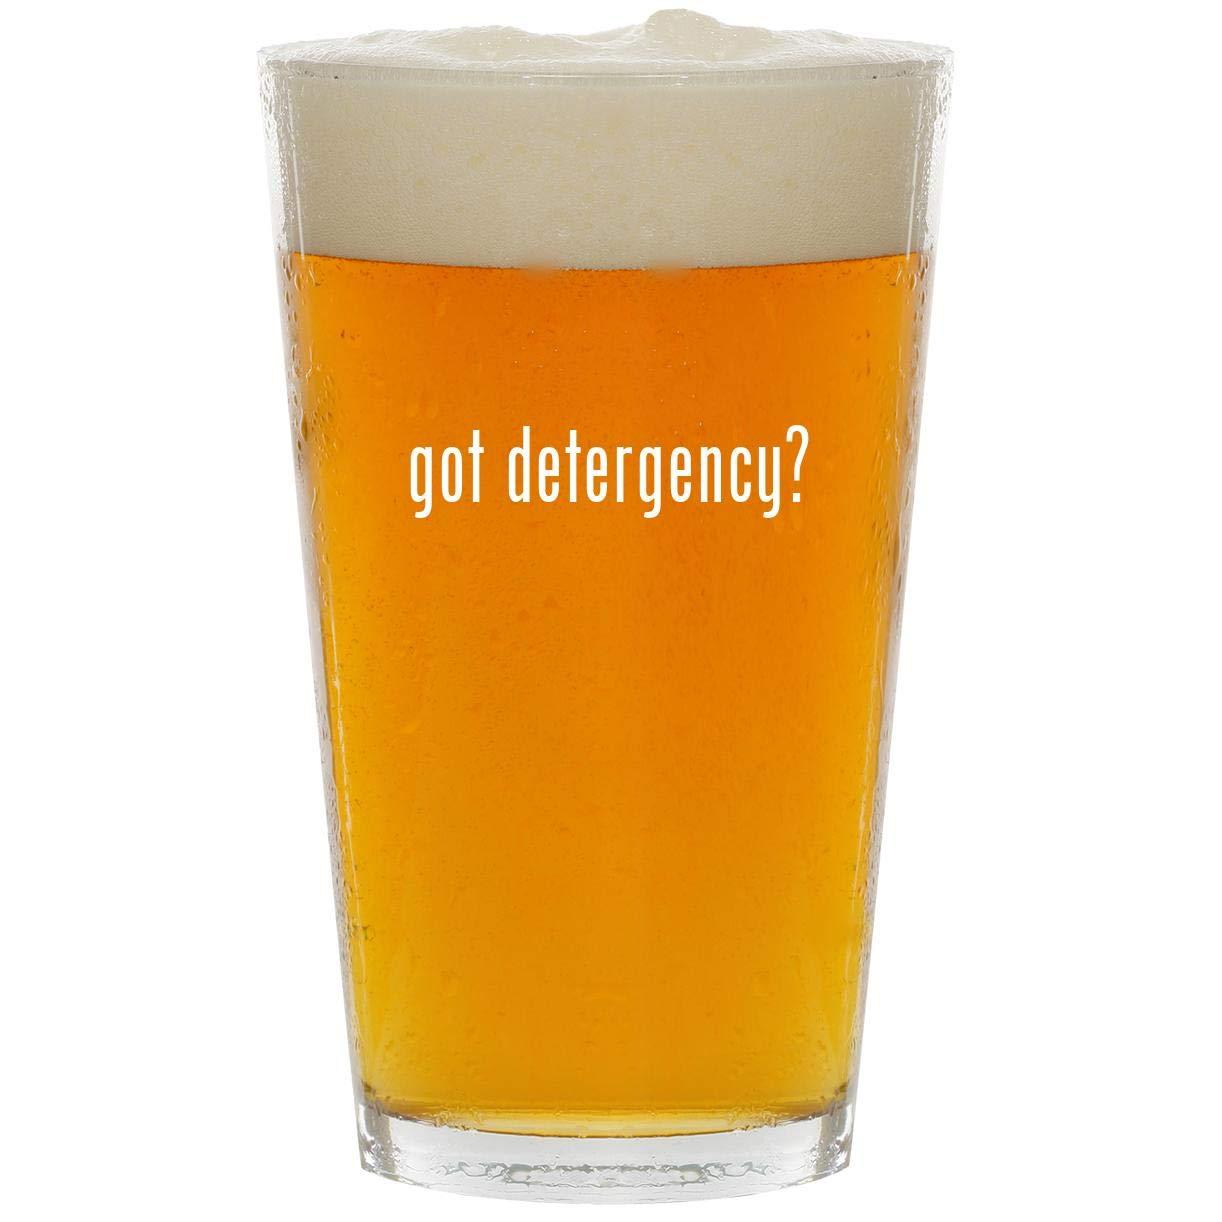 got detergency? - Glass 16oz Beer Pint